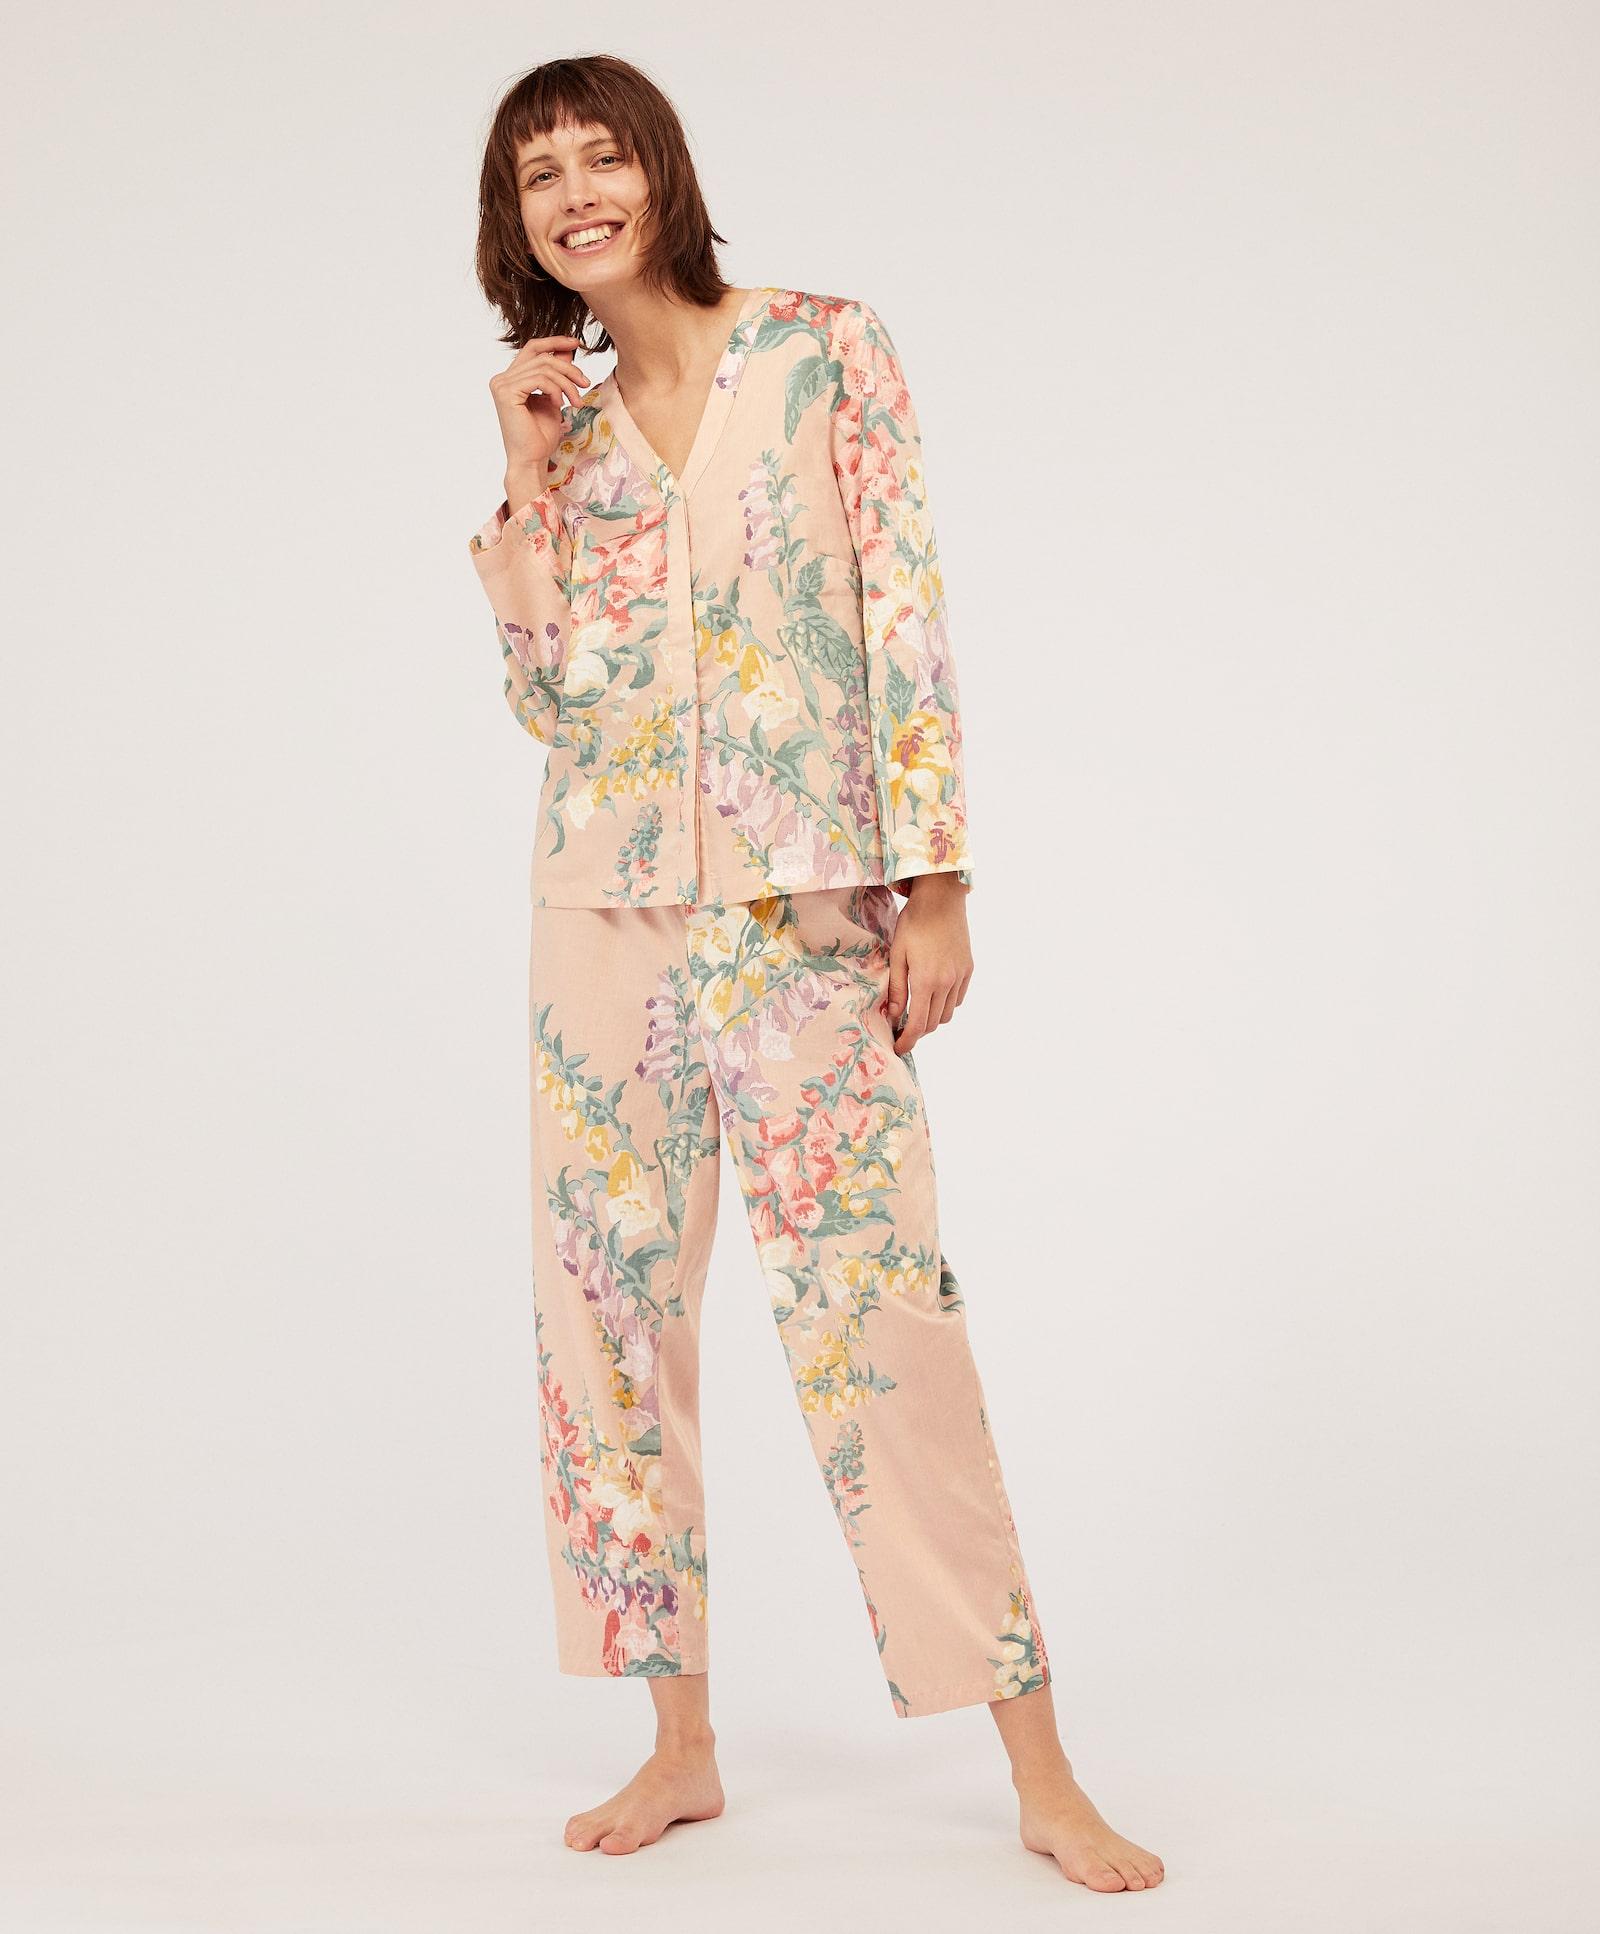 Oysho Campanilla Flower Shirt £25.99